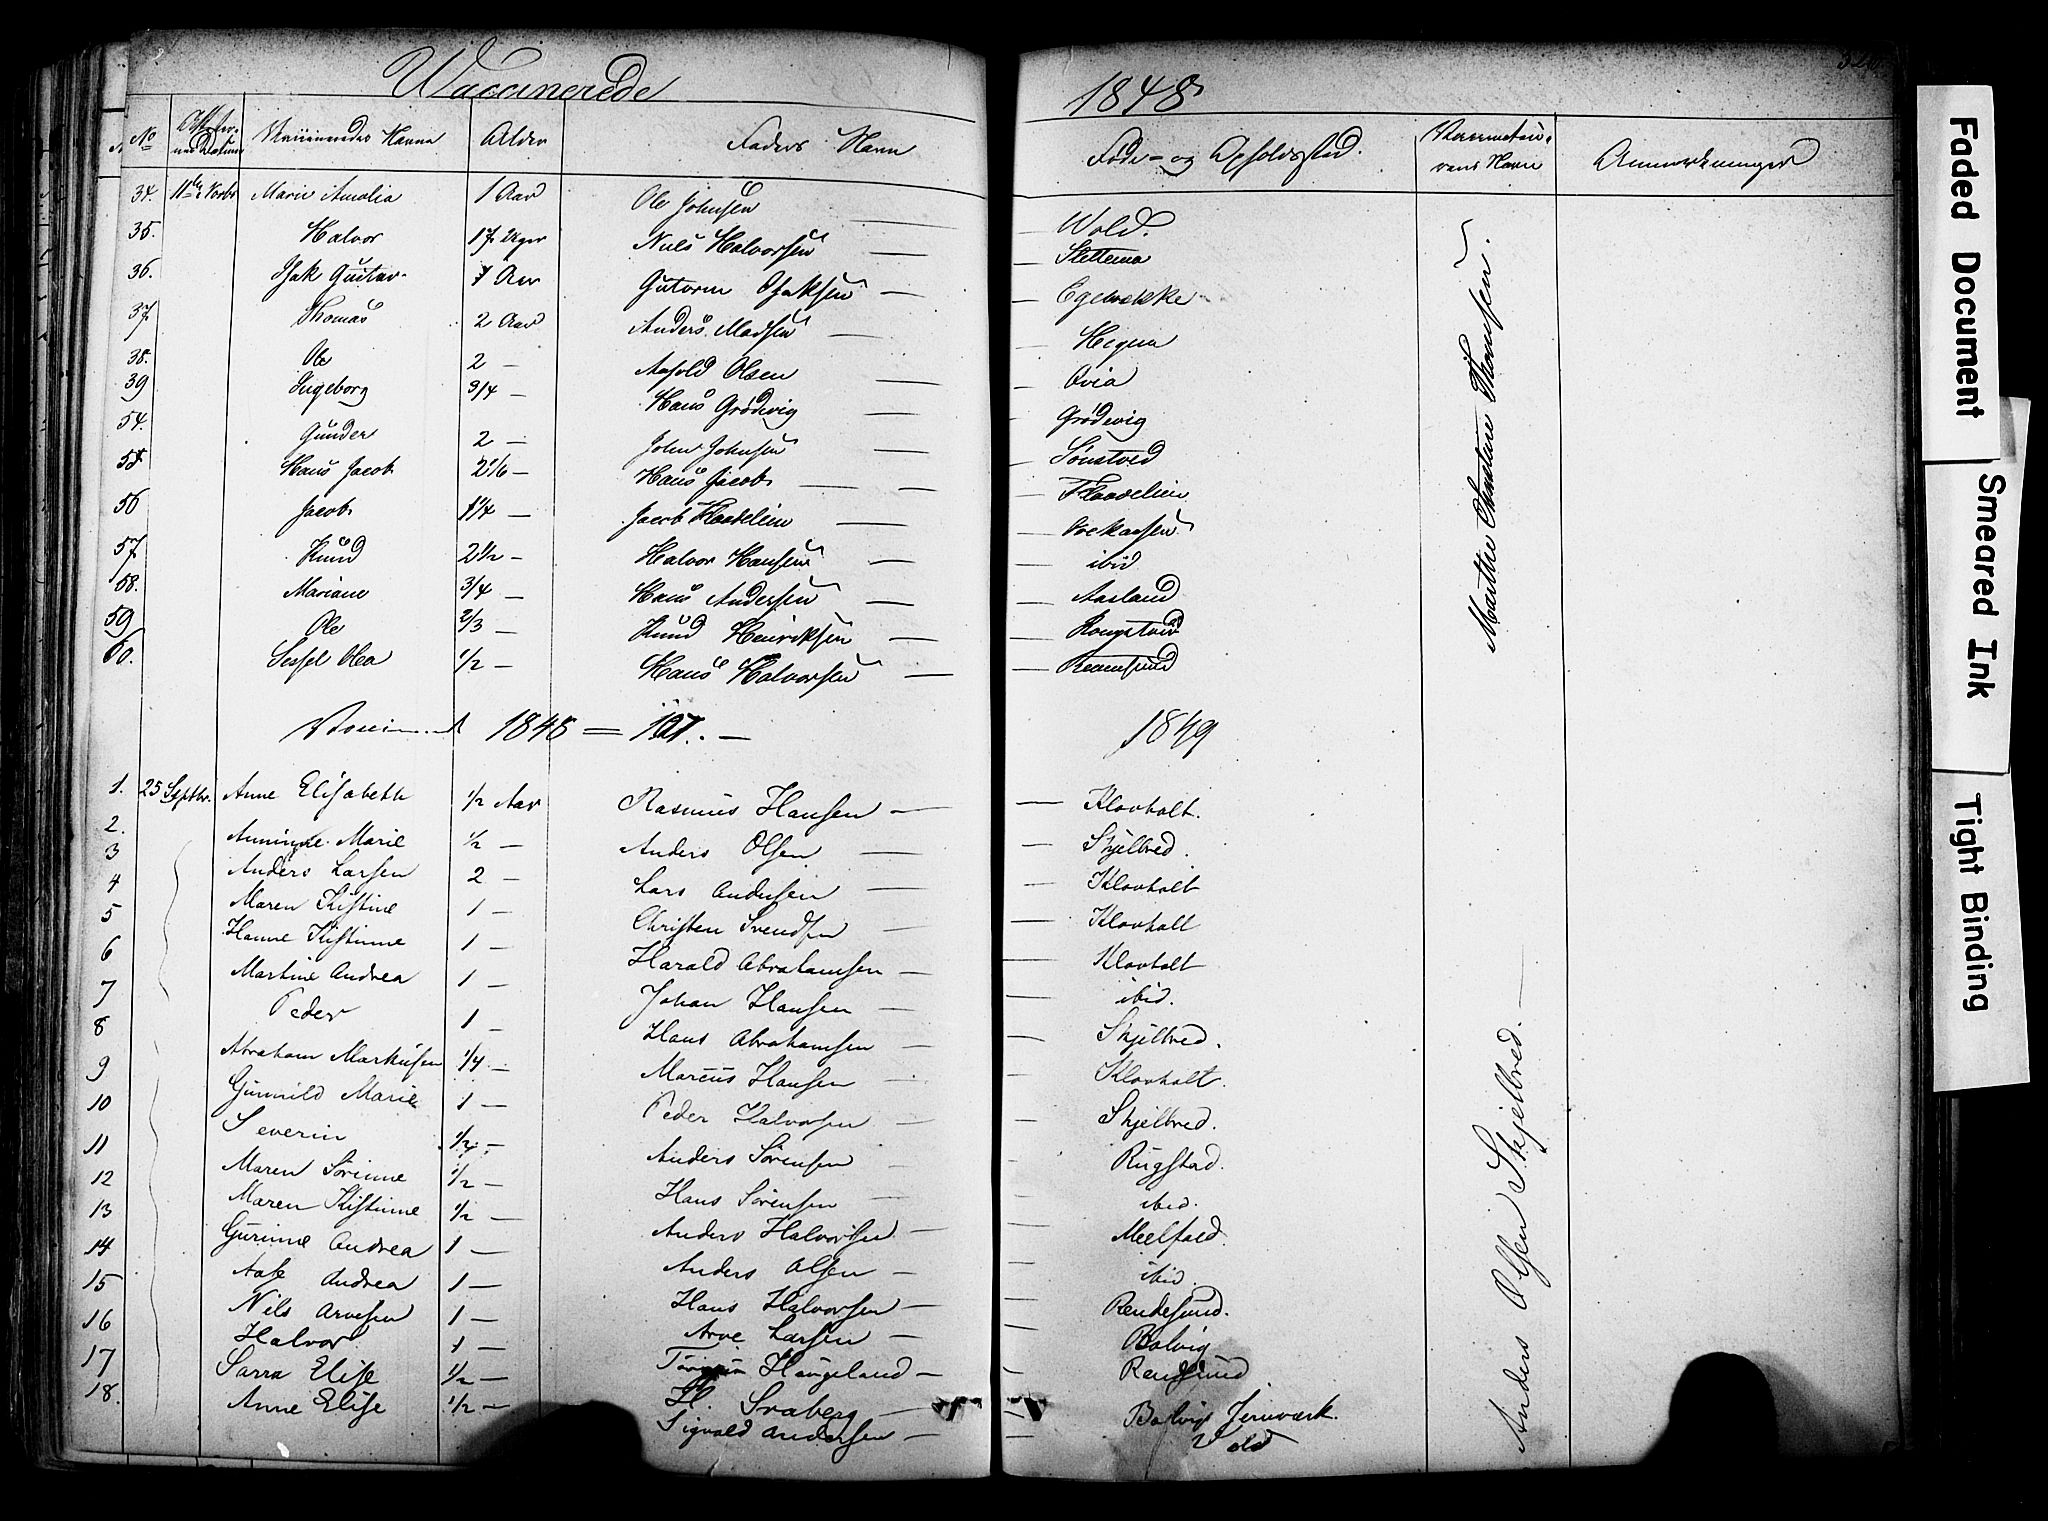 SAKO, Solum kirkebøker, F/Fa/L0006: Ministerialbok nr. I 6, 1844-1855, s. 526